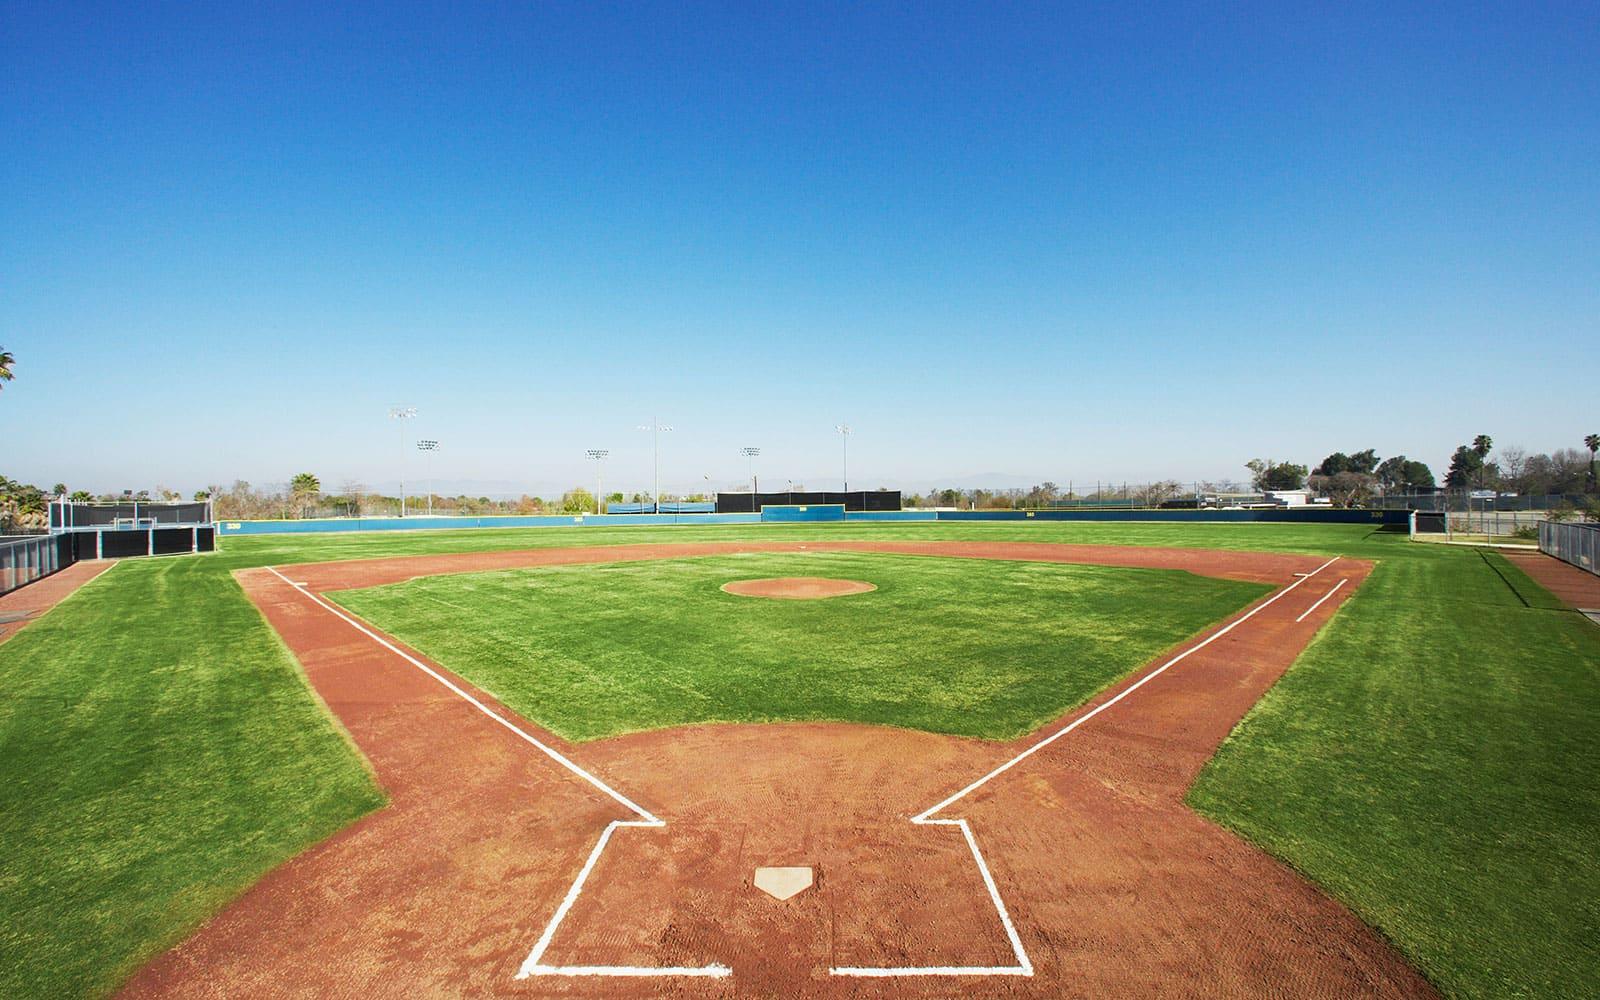 Daytona Beach Jackie Robinson Ballpark